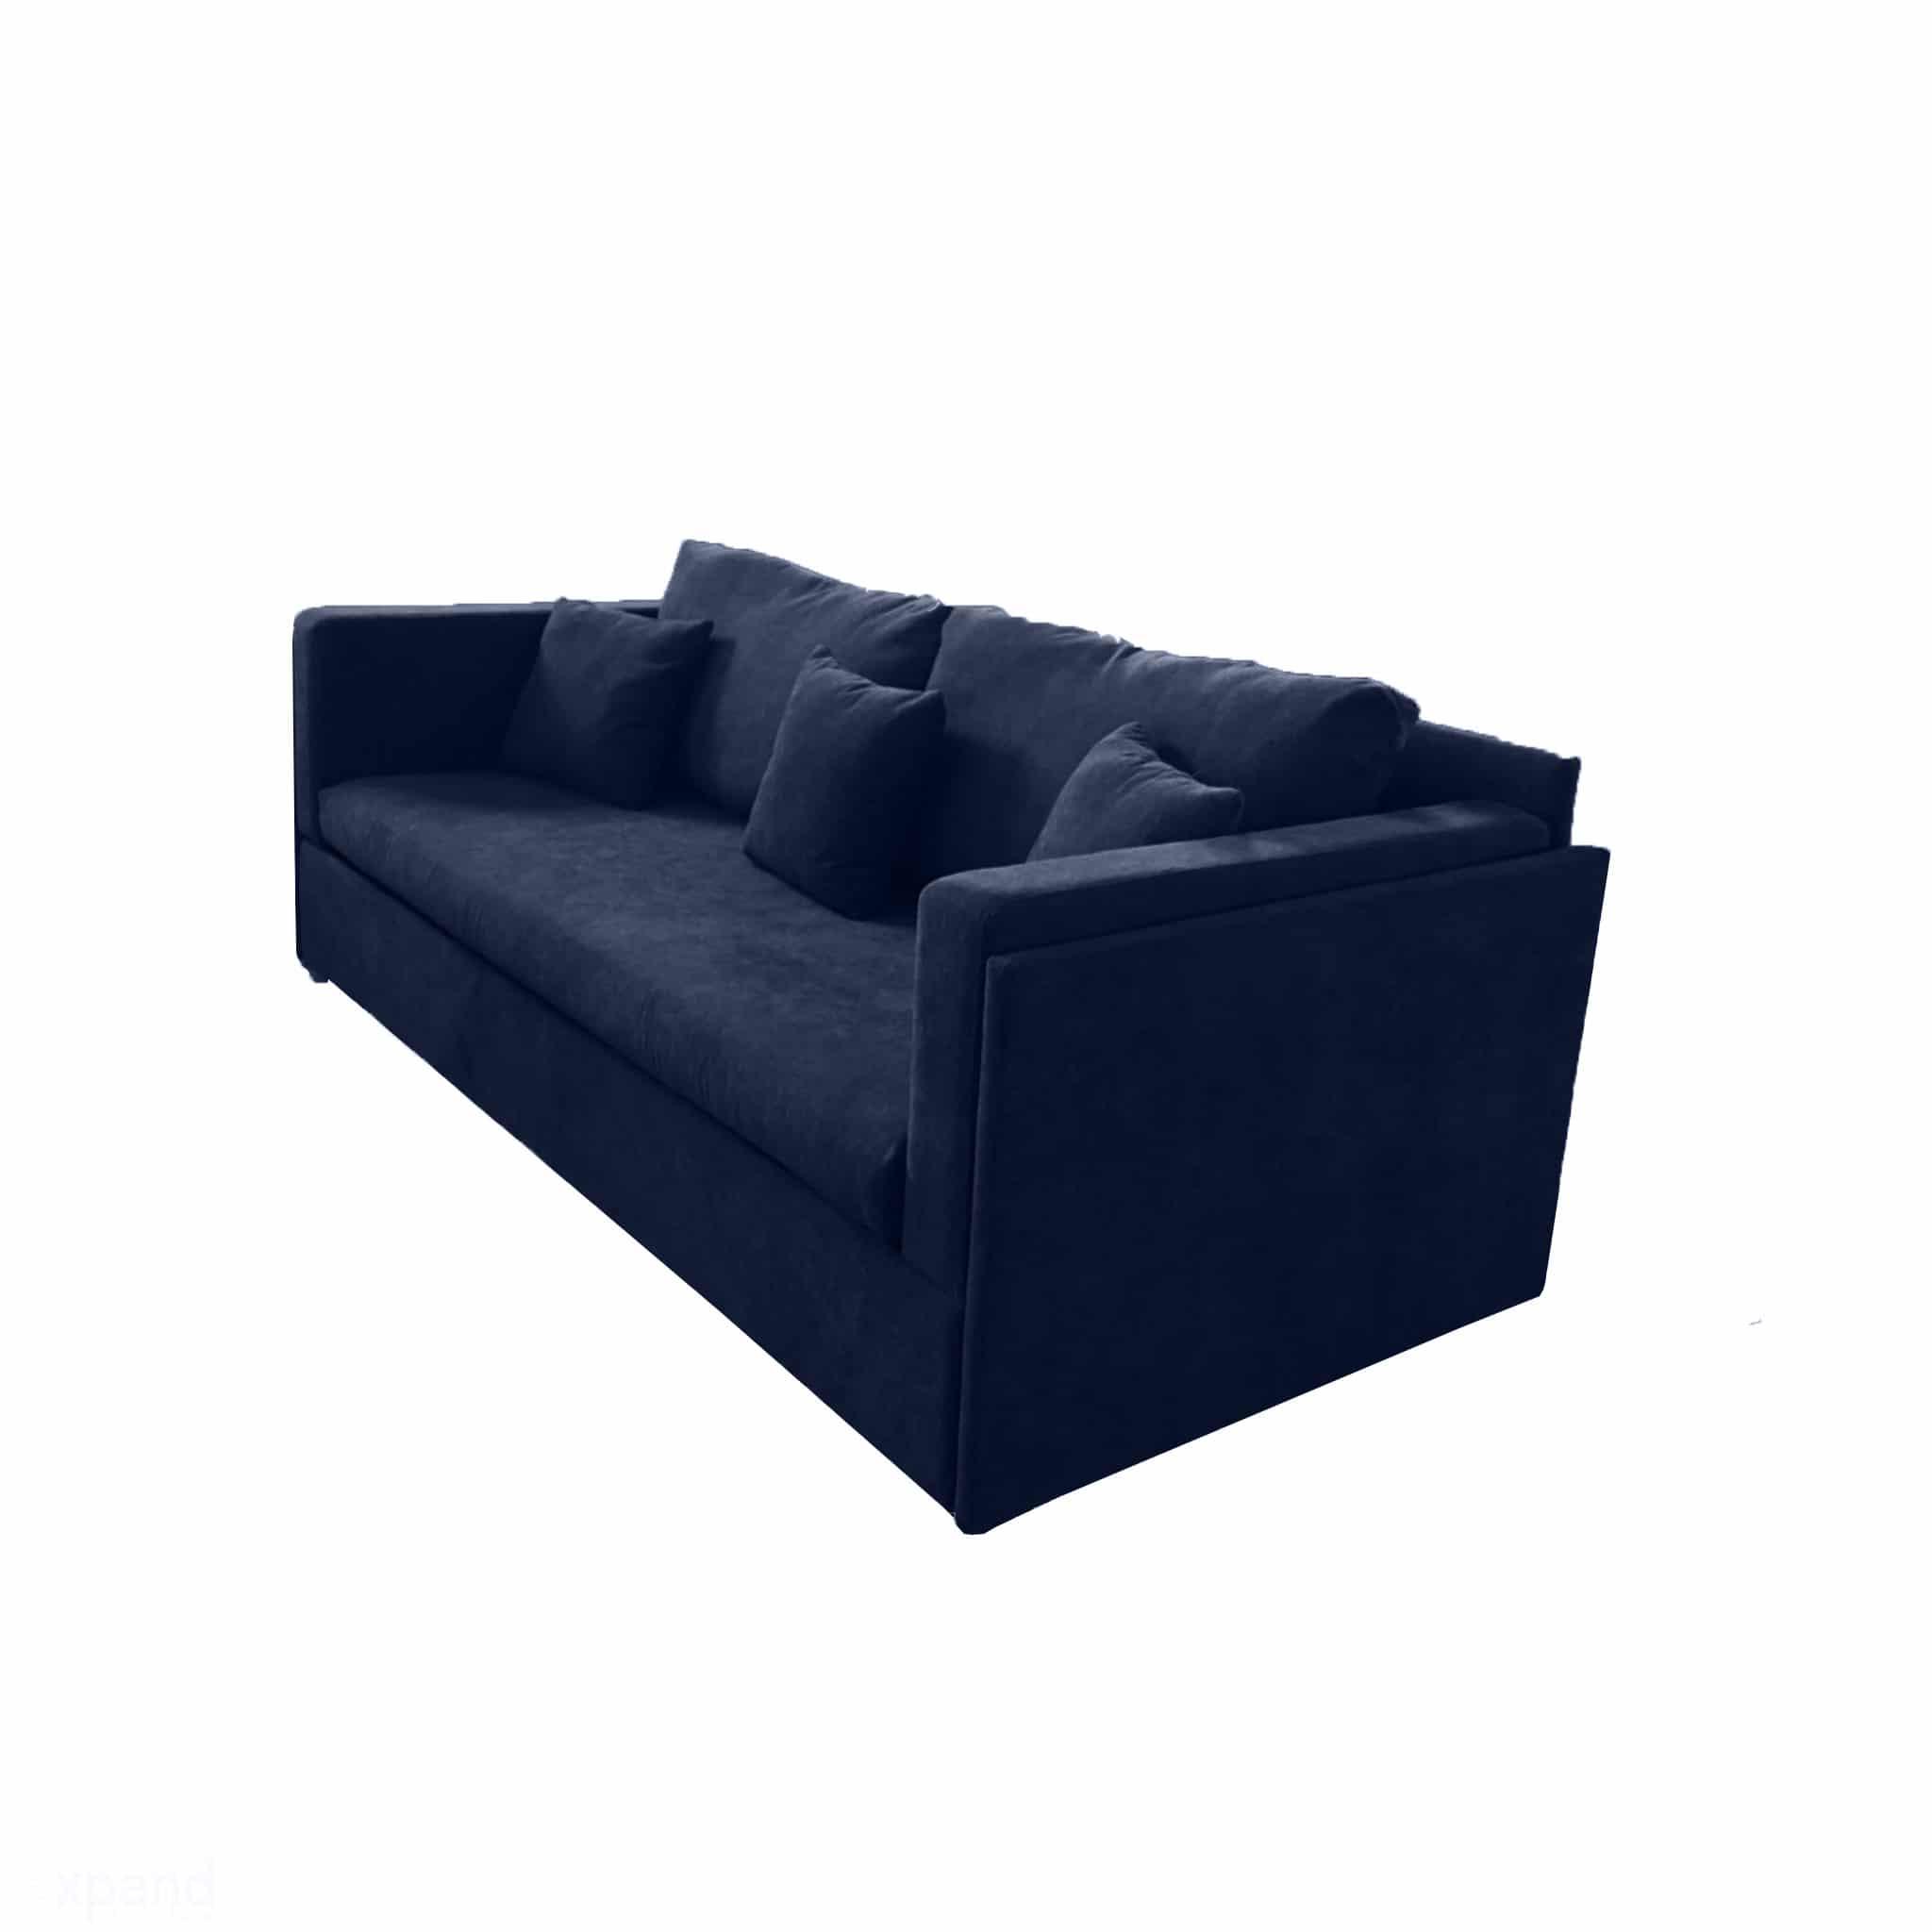 Dormire-Sofa-Bunk-Bed-in-blue-fabric-soft-sleeps-2-people